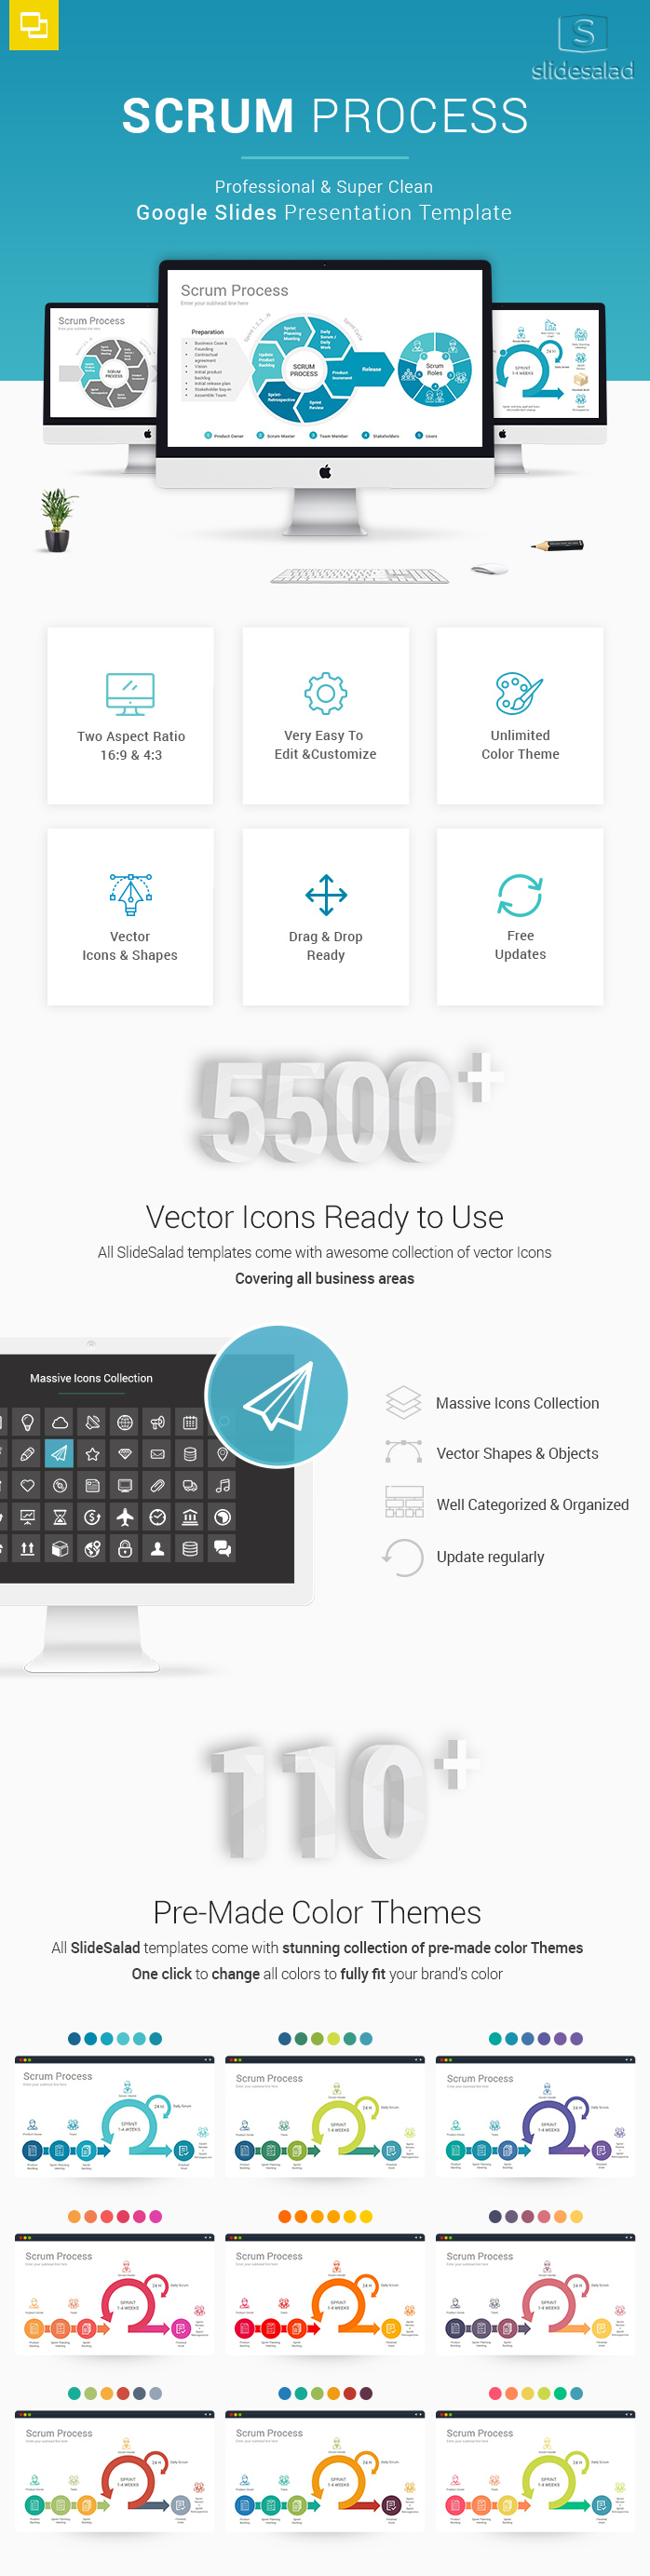 Scrum Process Google Slides Presentation Template